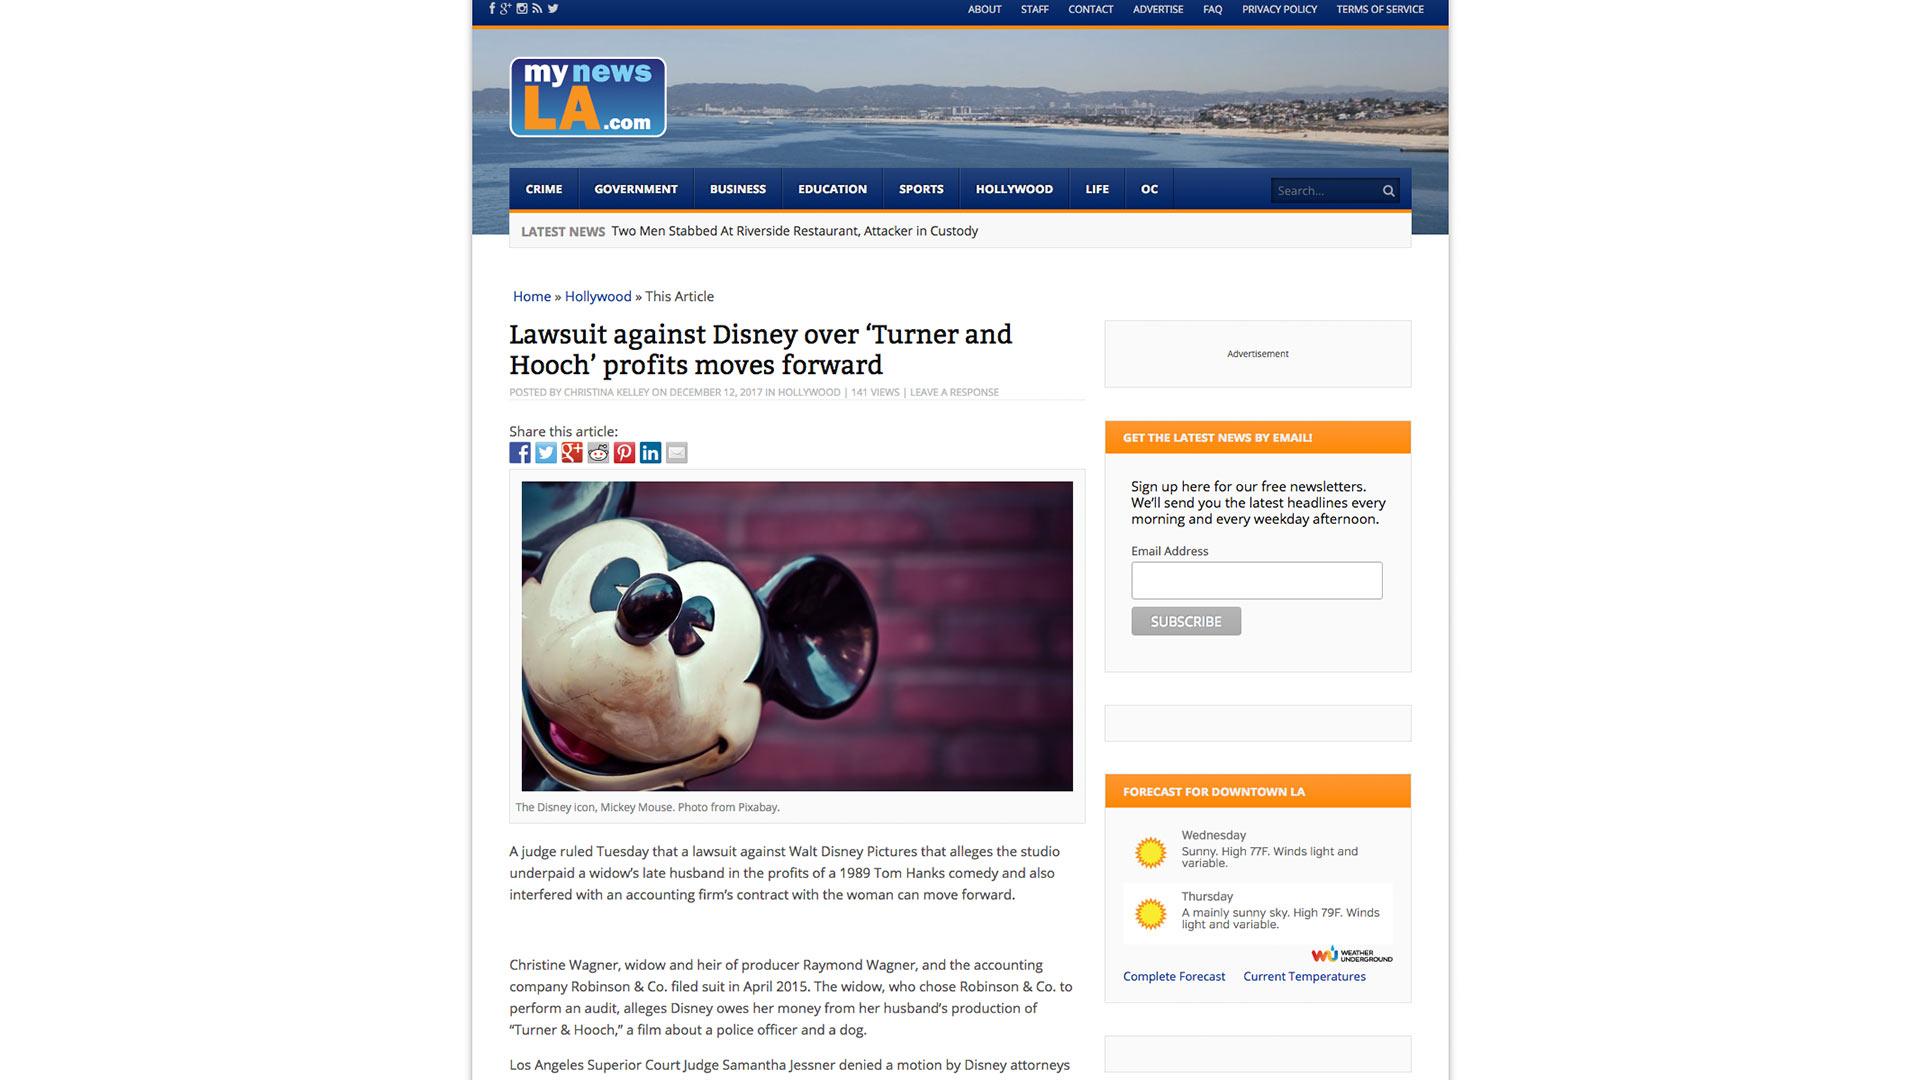 Fairness Rocks News Lawsuit against Disney over 'Turner and Hooch' profits moves forward